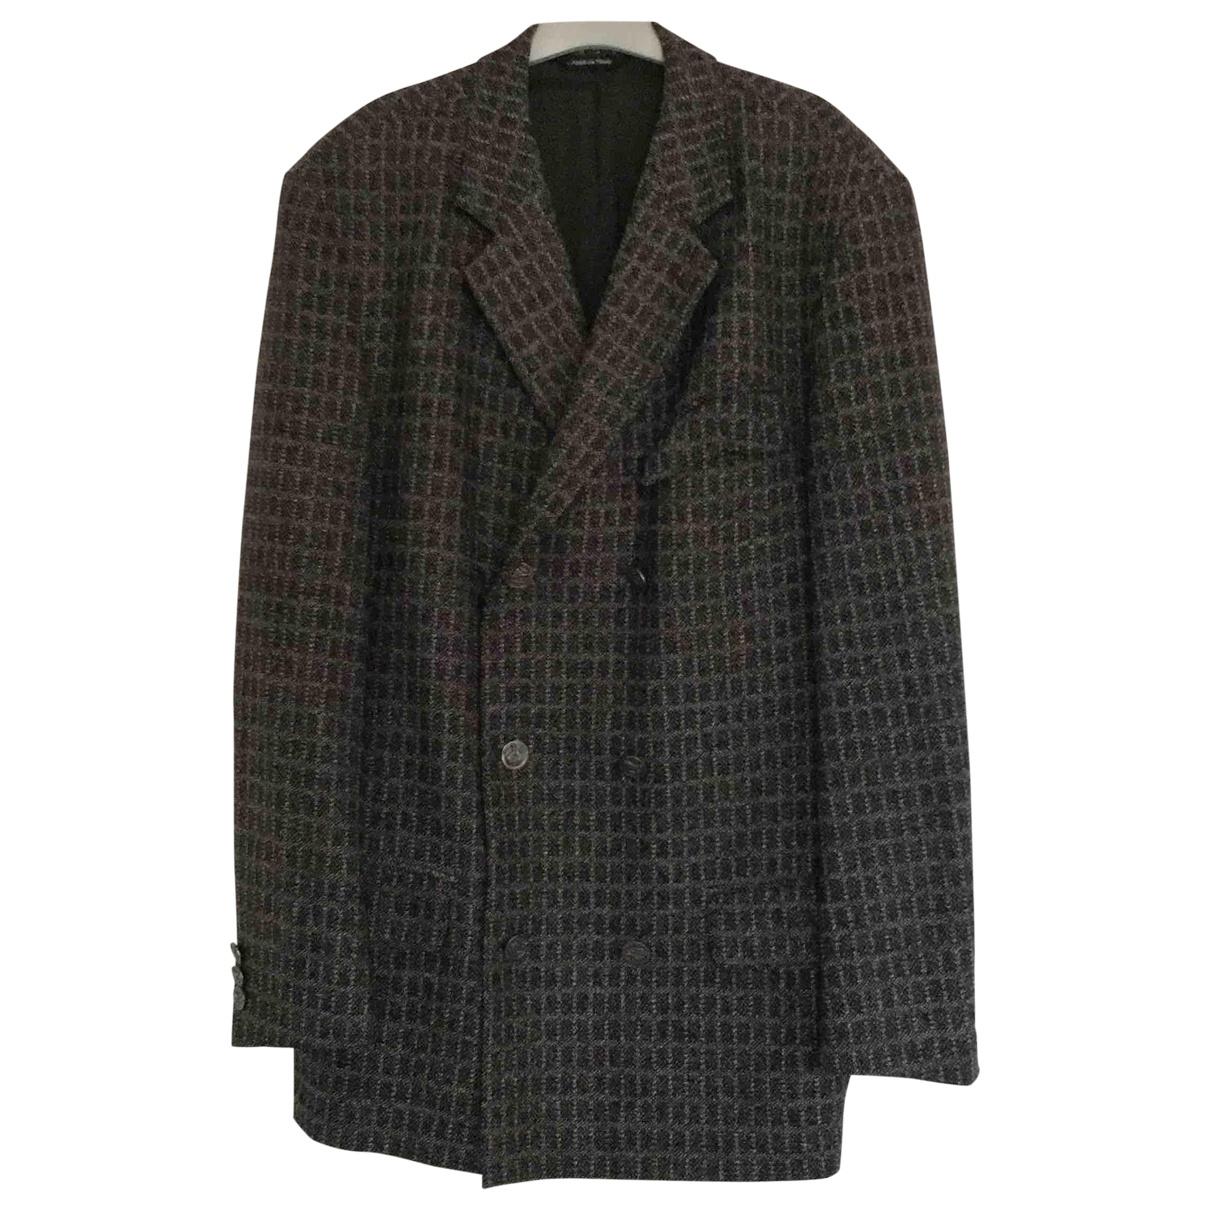 Versus \N Anthracite Wool jacket  for Men L